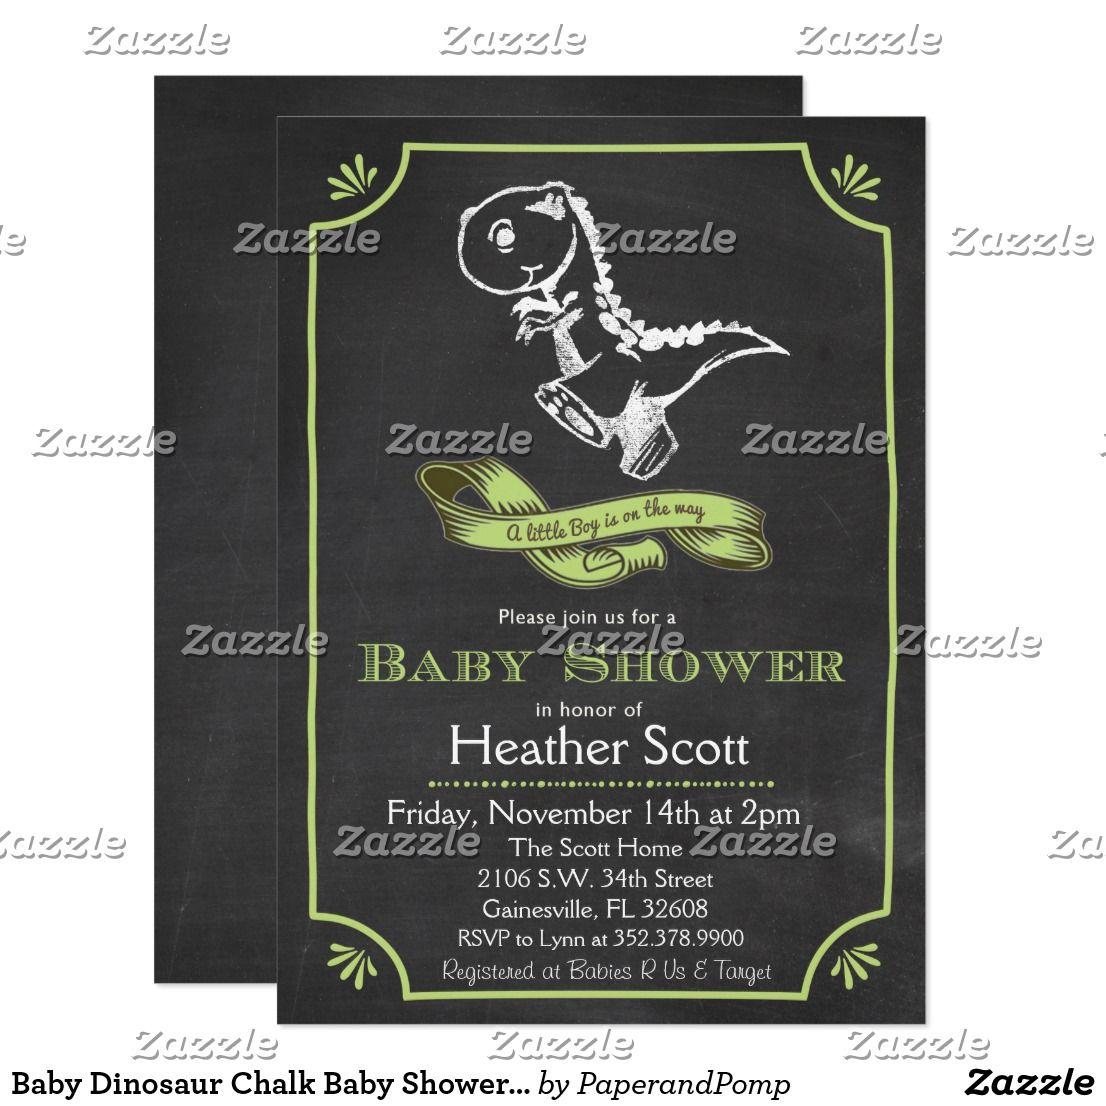 Baby Dinosaur Chalk Baby Shower Invitation | Shower invitations